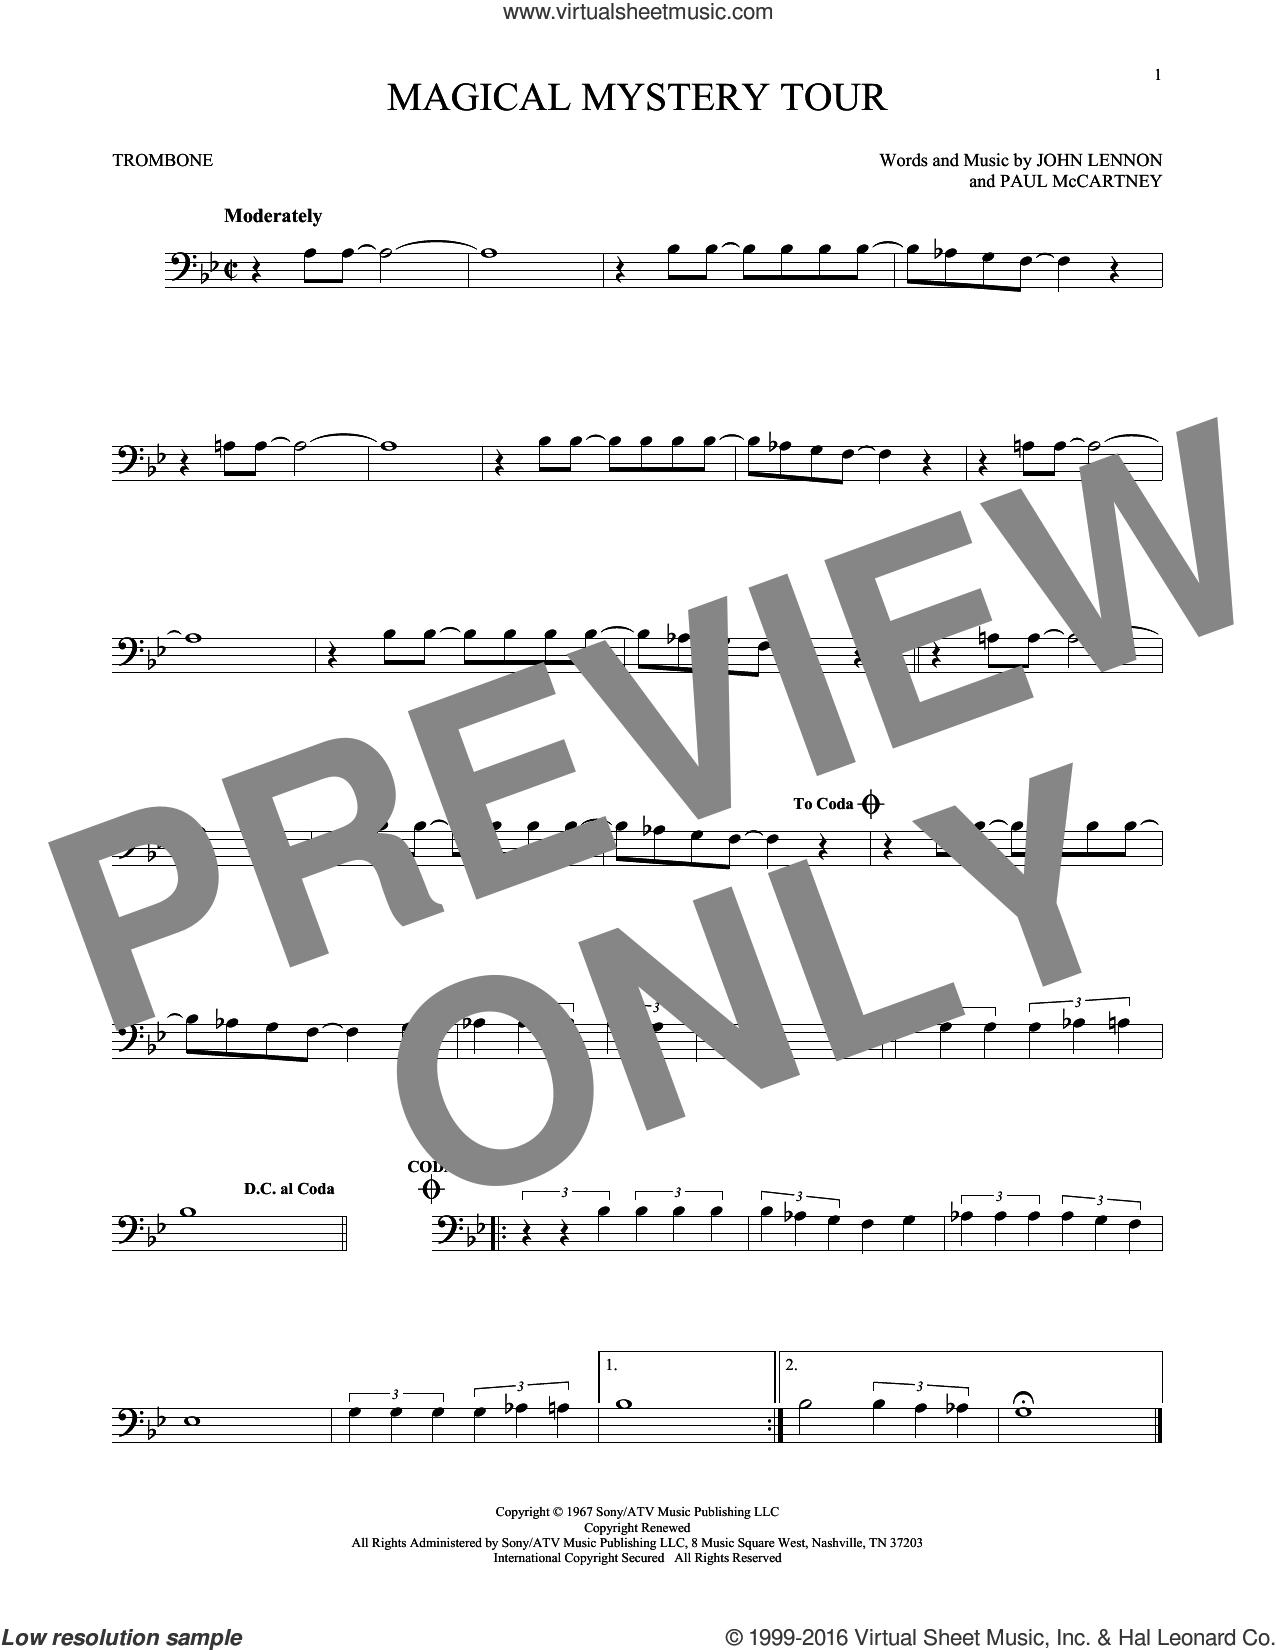 Magical Mystery Tour sheet music for trombone solo by The Beatles, John Lennon and Paul McCartney, intermediate skill level